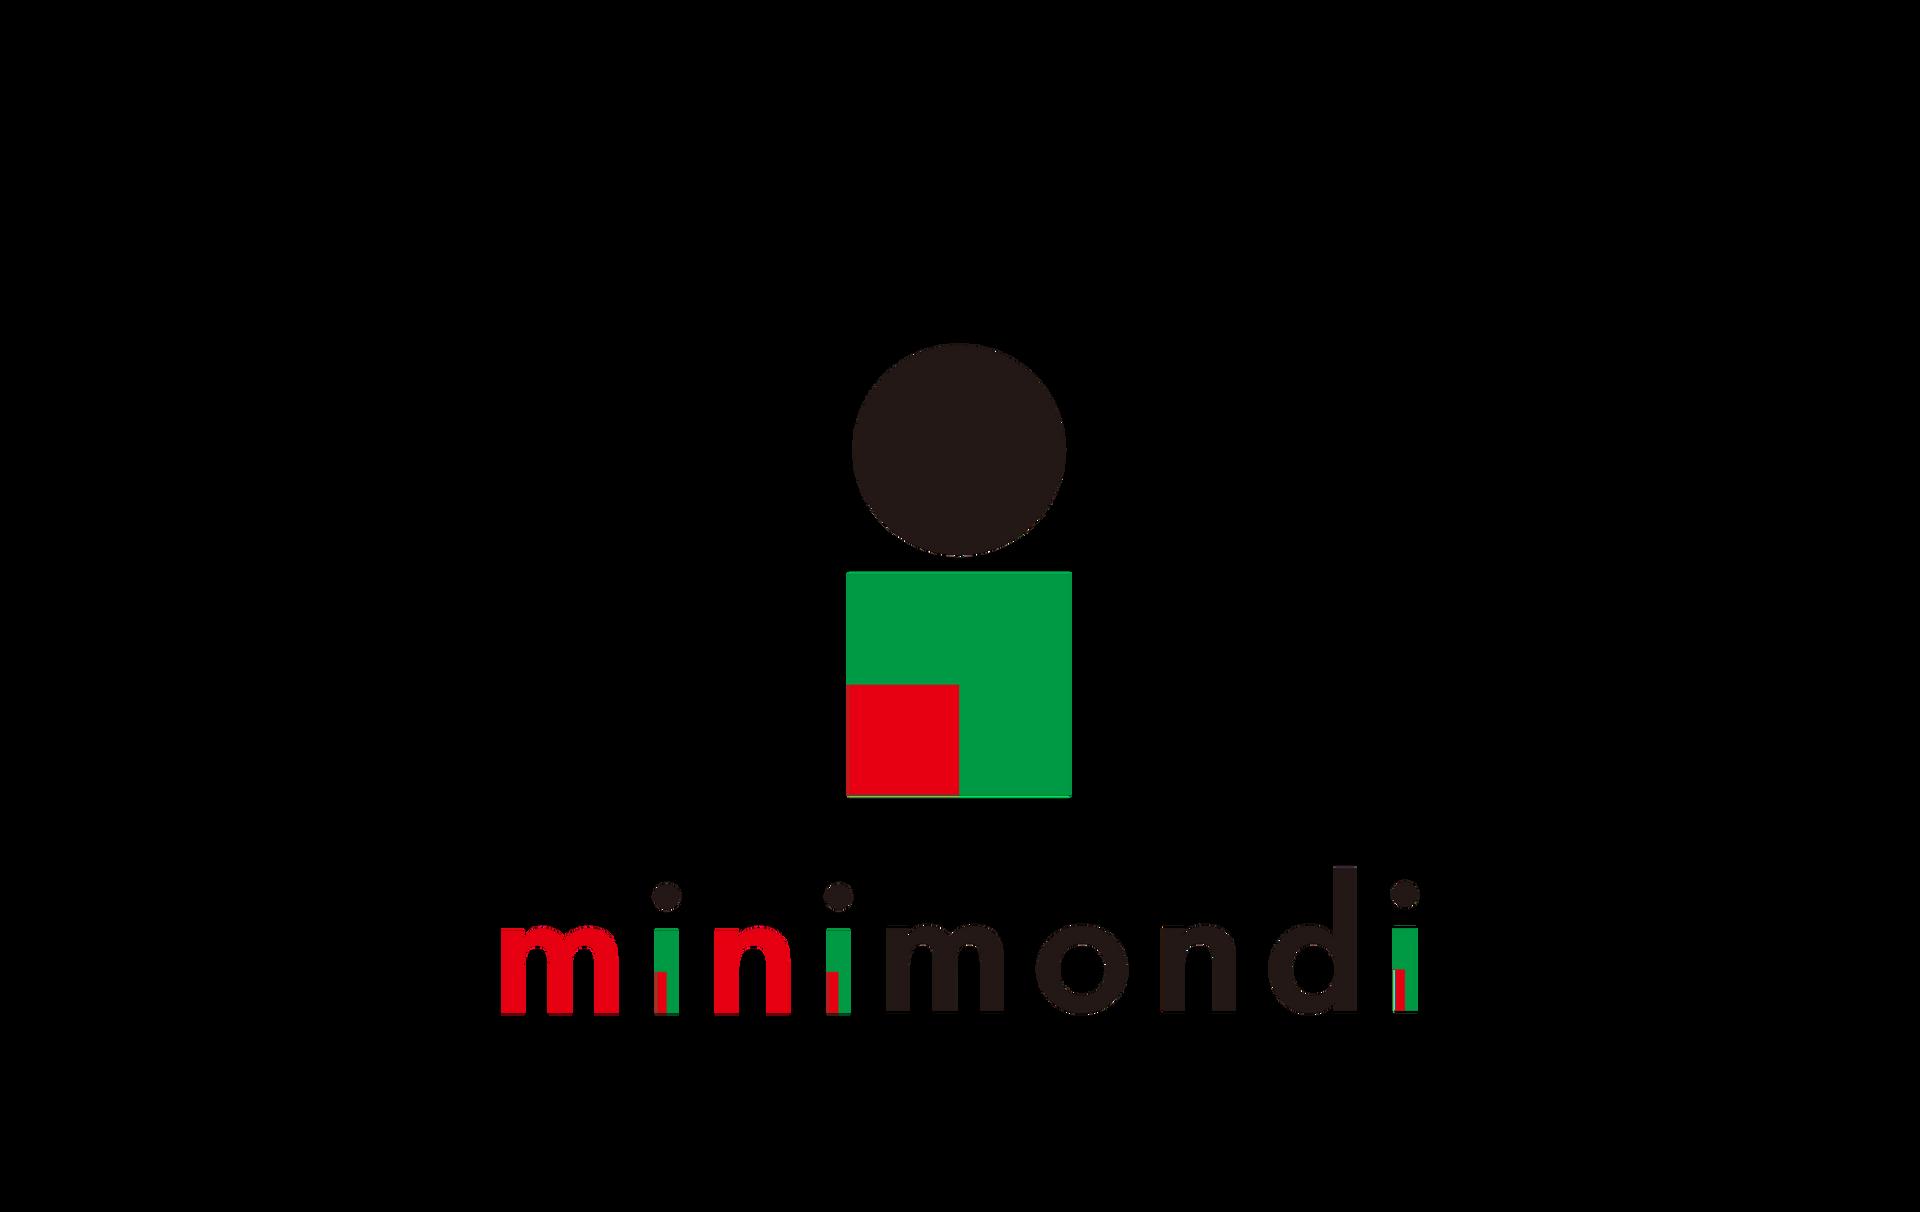 minimondi-logo_edited.png